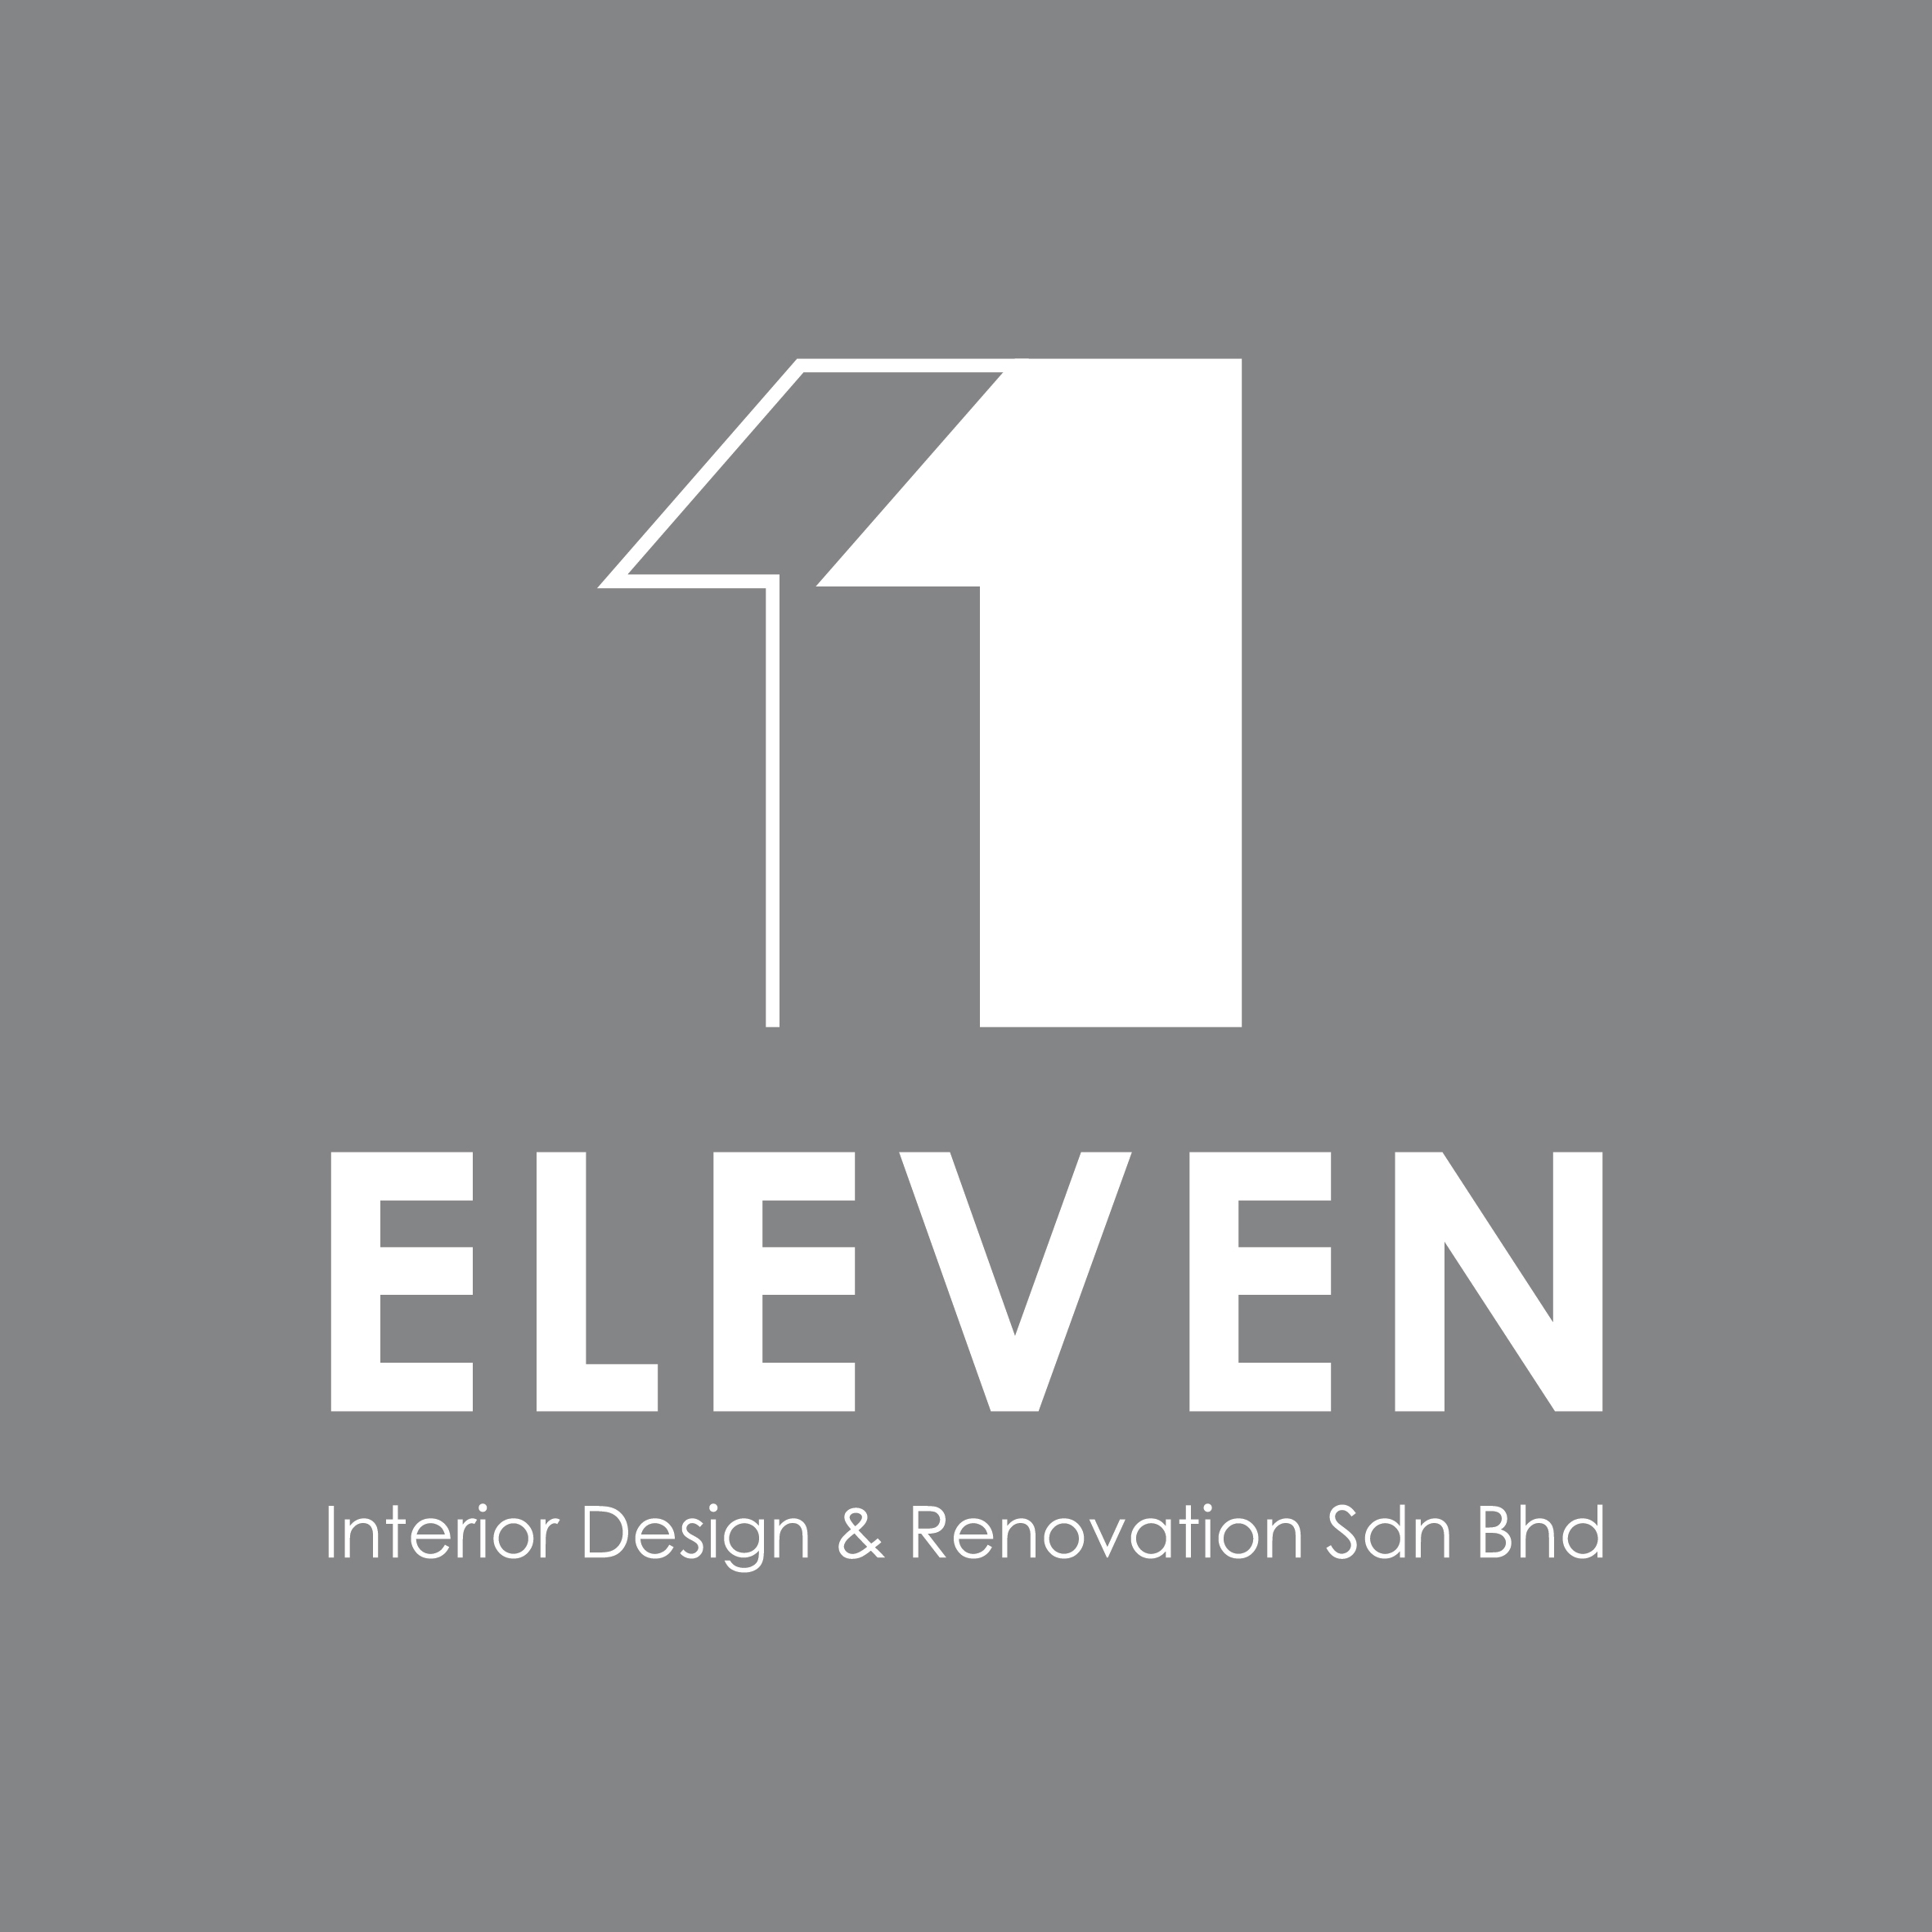 eleven-interior-design-renovation-sdn-bhd Logo